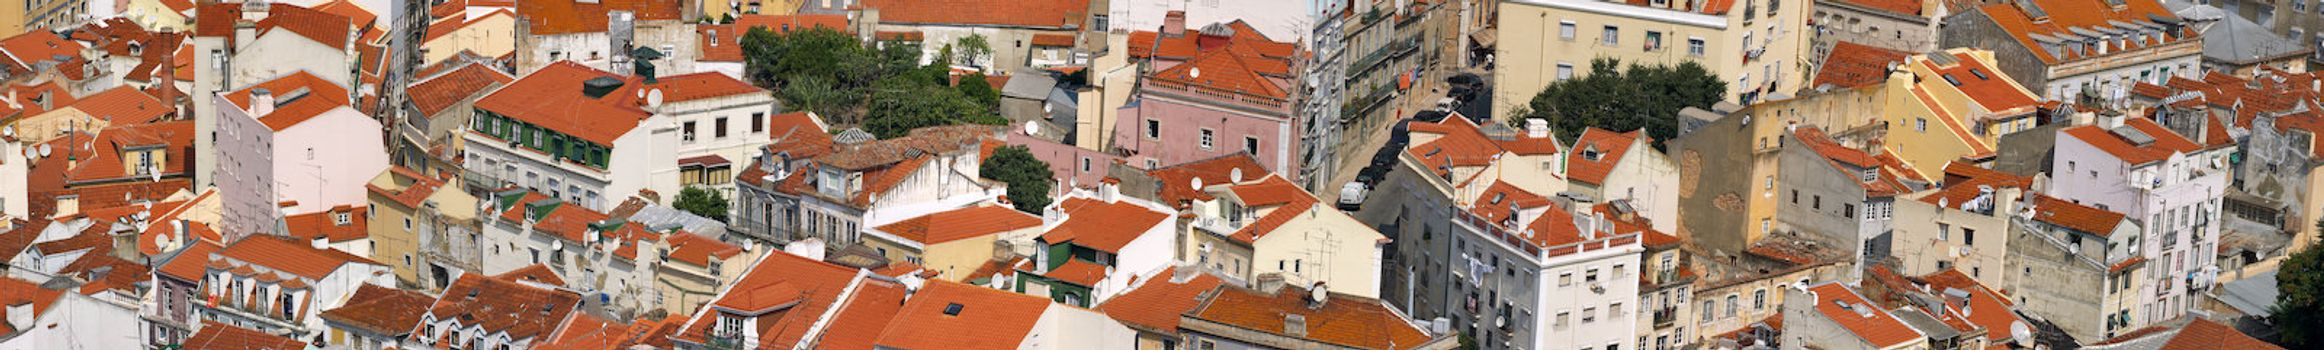 Central Lisbon